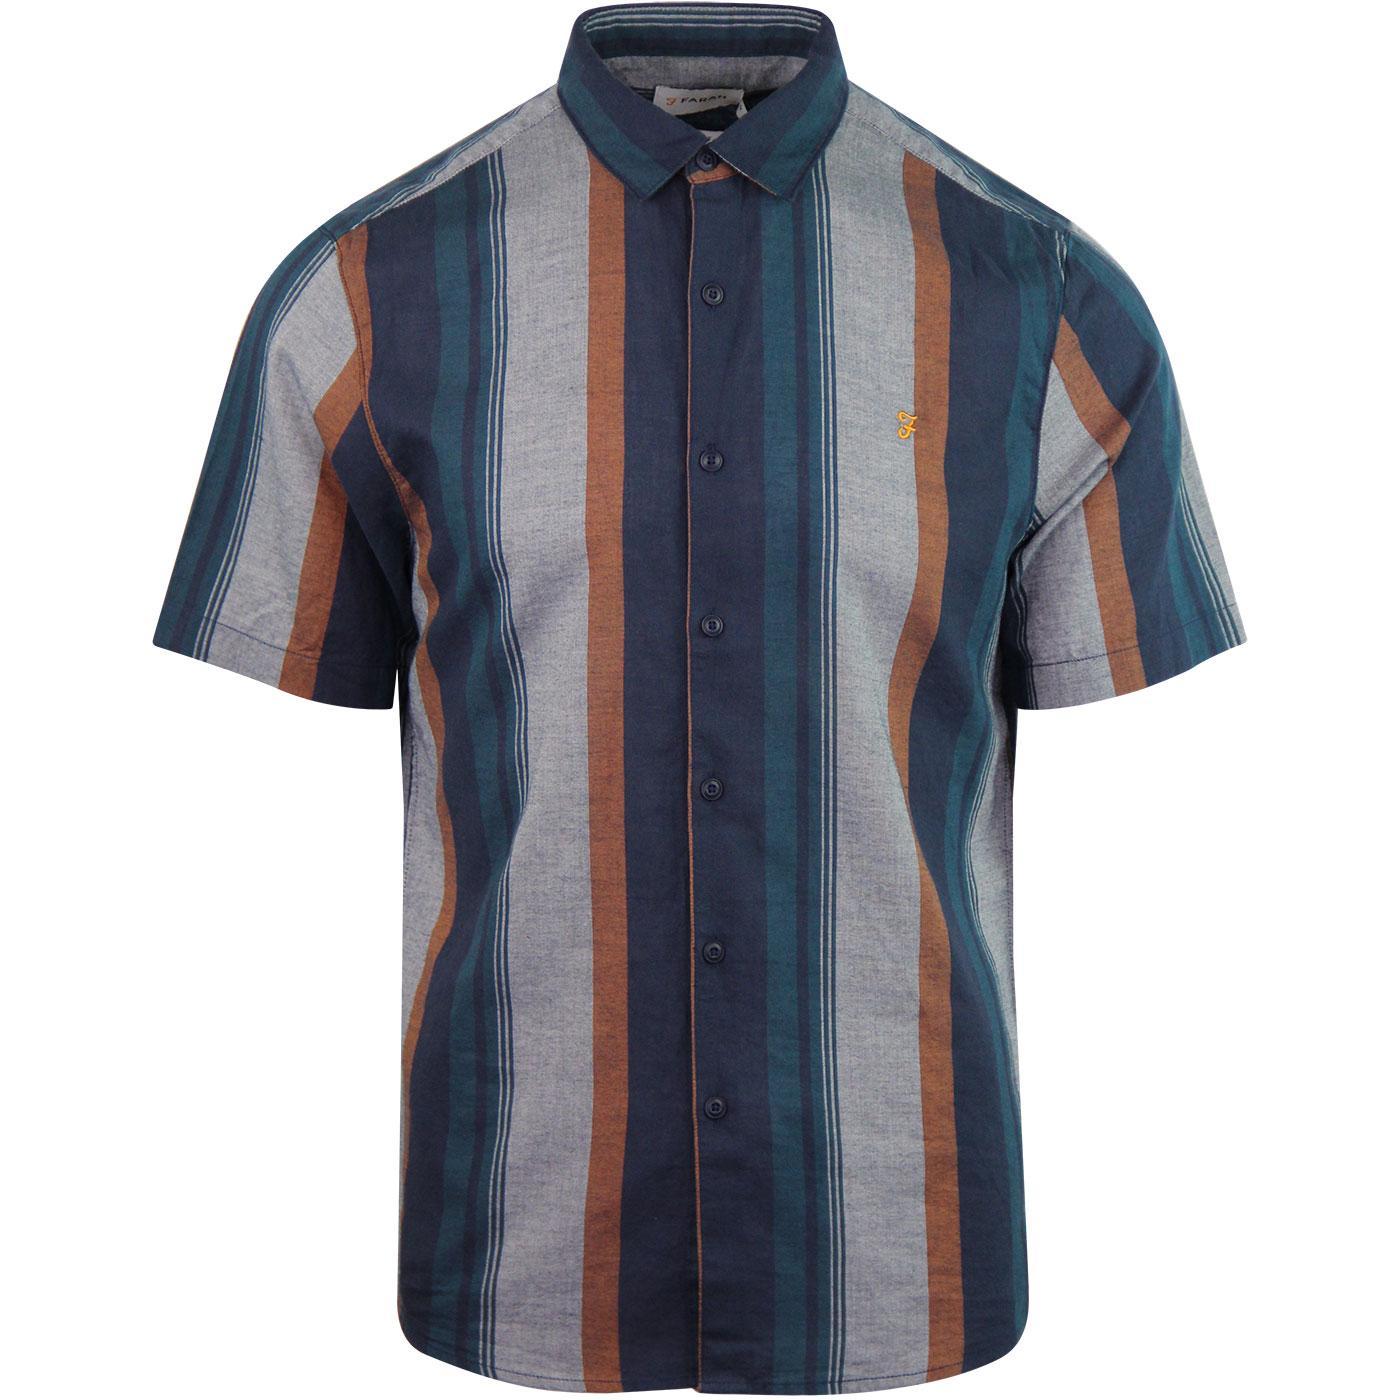 Donnally FARAH Retro 60s Mod Texture Stripe Shirt